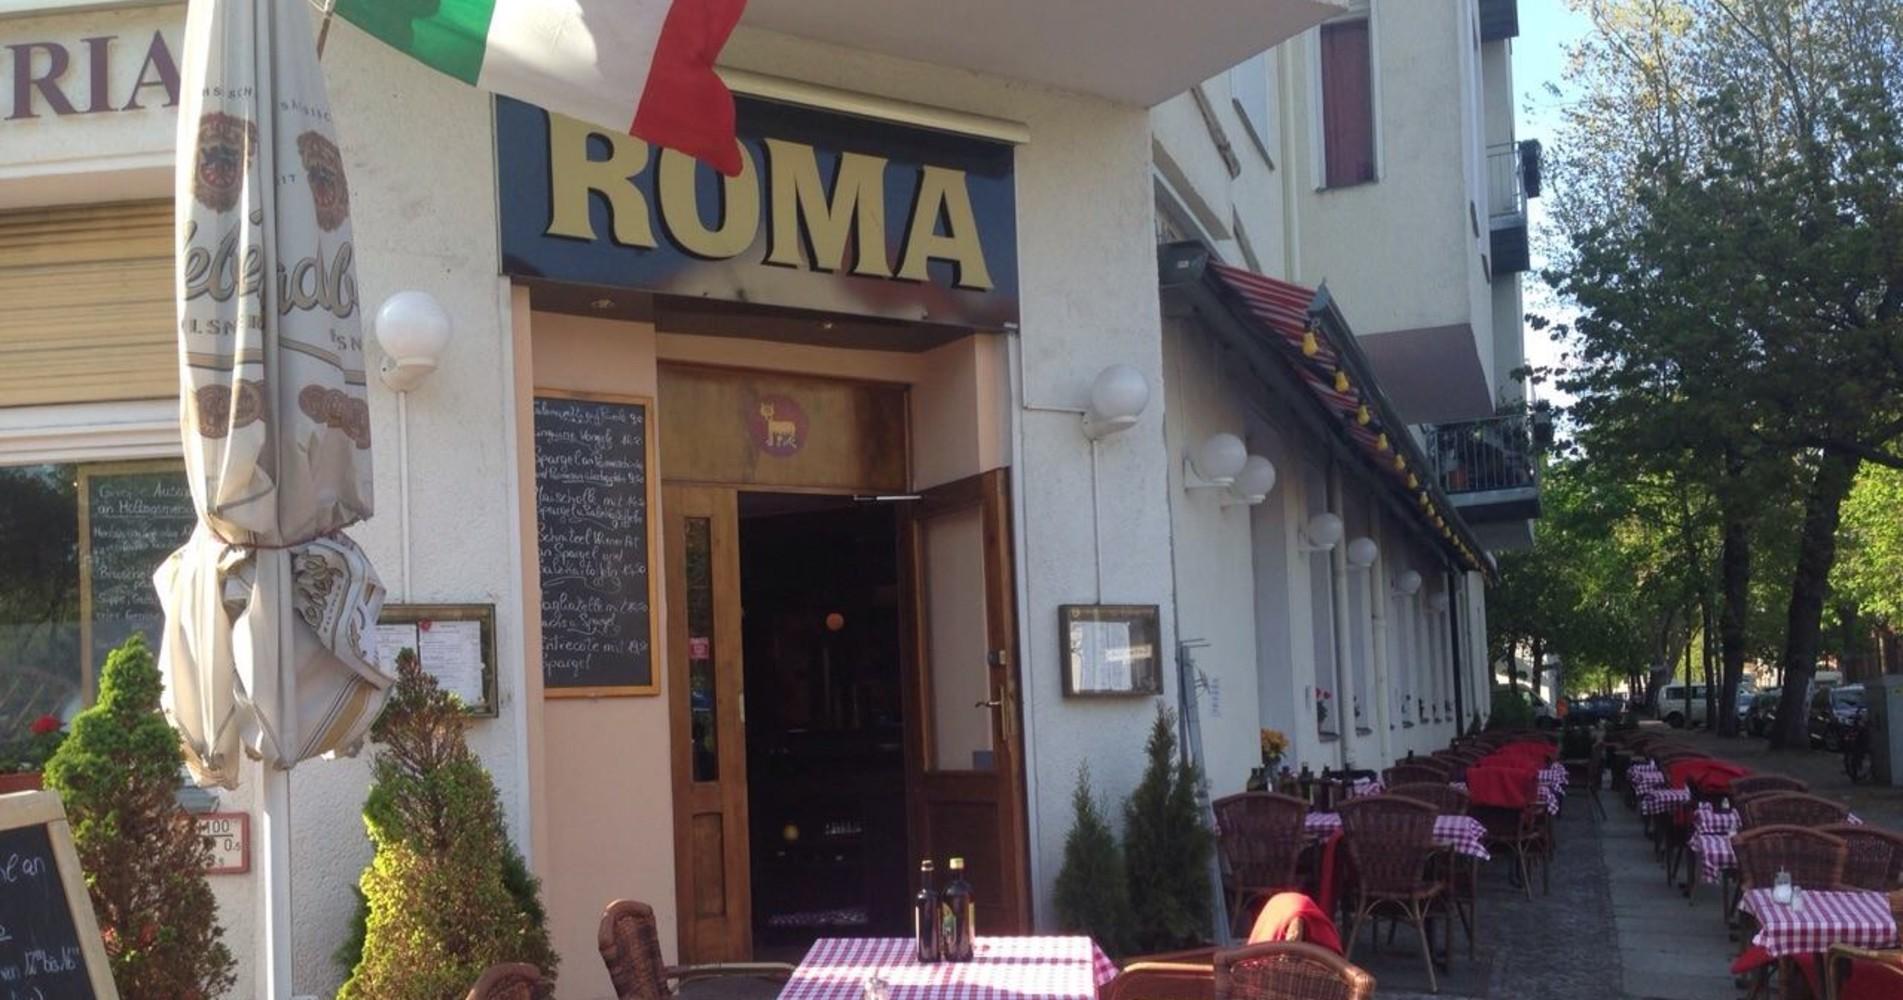 trattoria pizzaria roma italienisches restaurant berlin. Black Bedroom Furniture Sets. Home Design Ideas